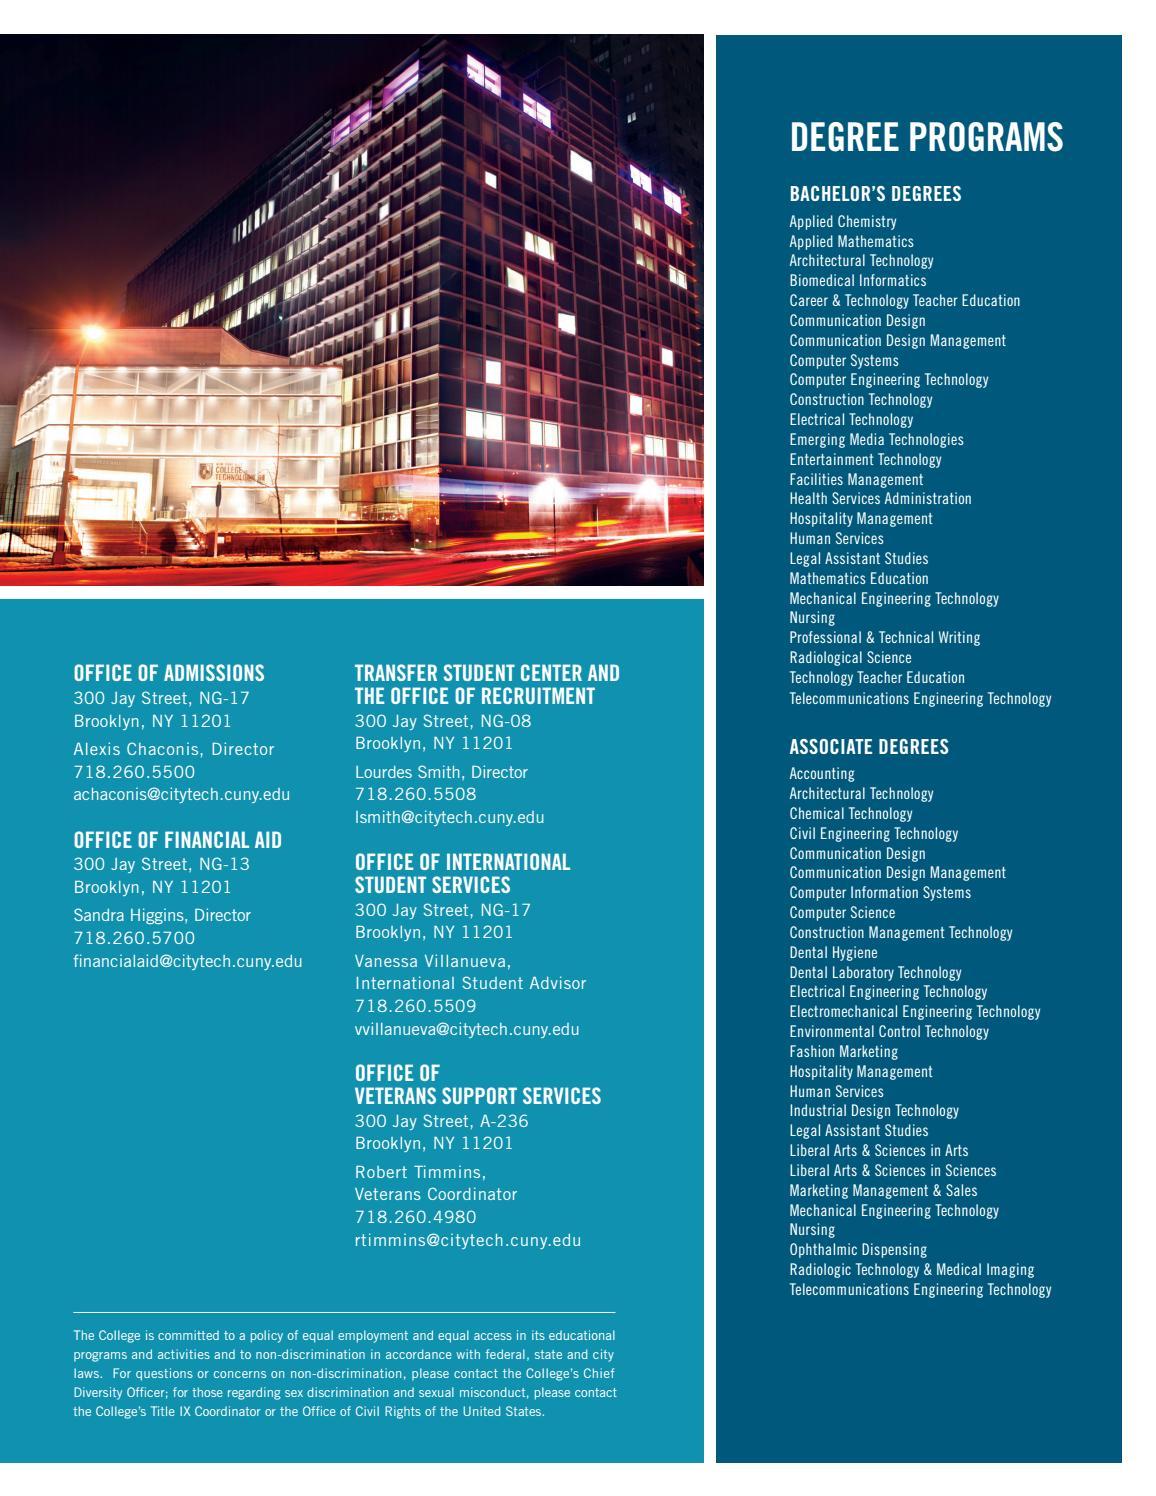 Viewbook: City Tech Value by City Tech - issuu